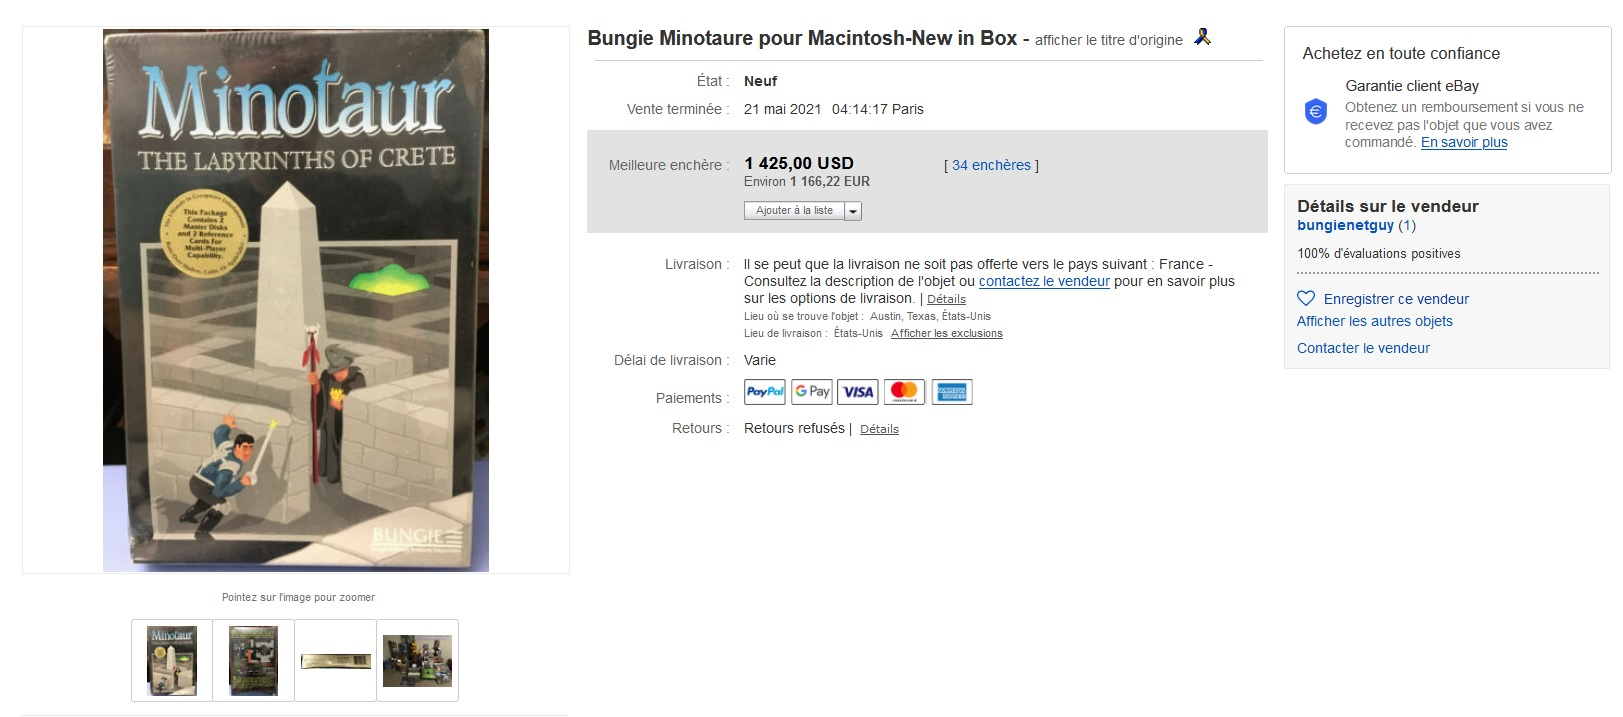 macintosh-bungie-minotaur-01